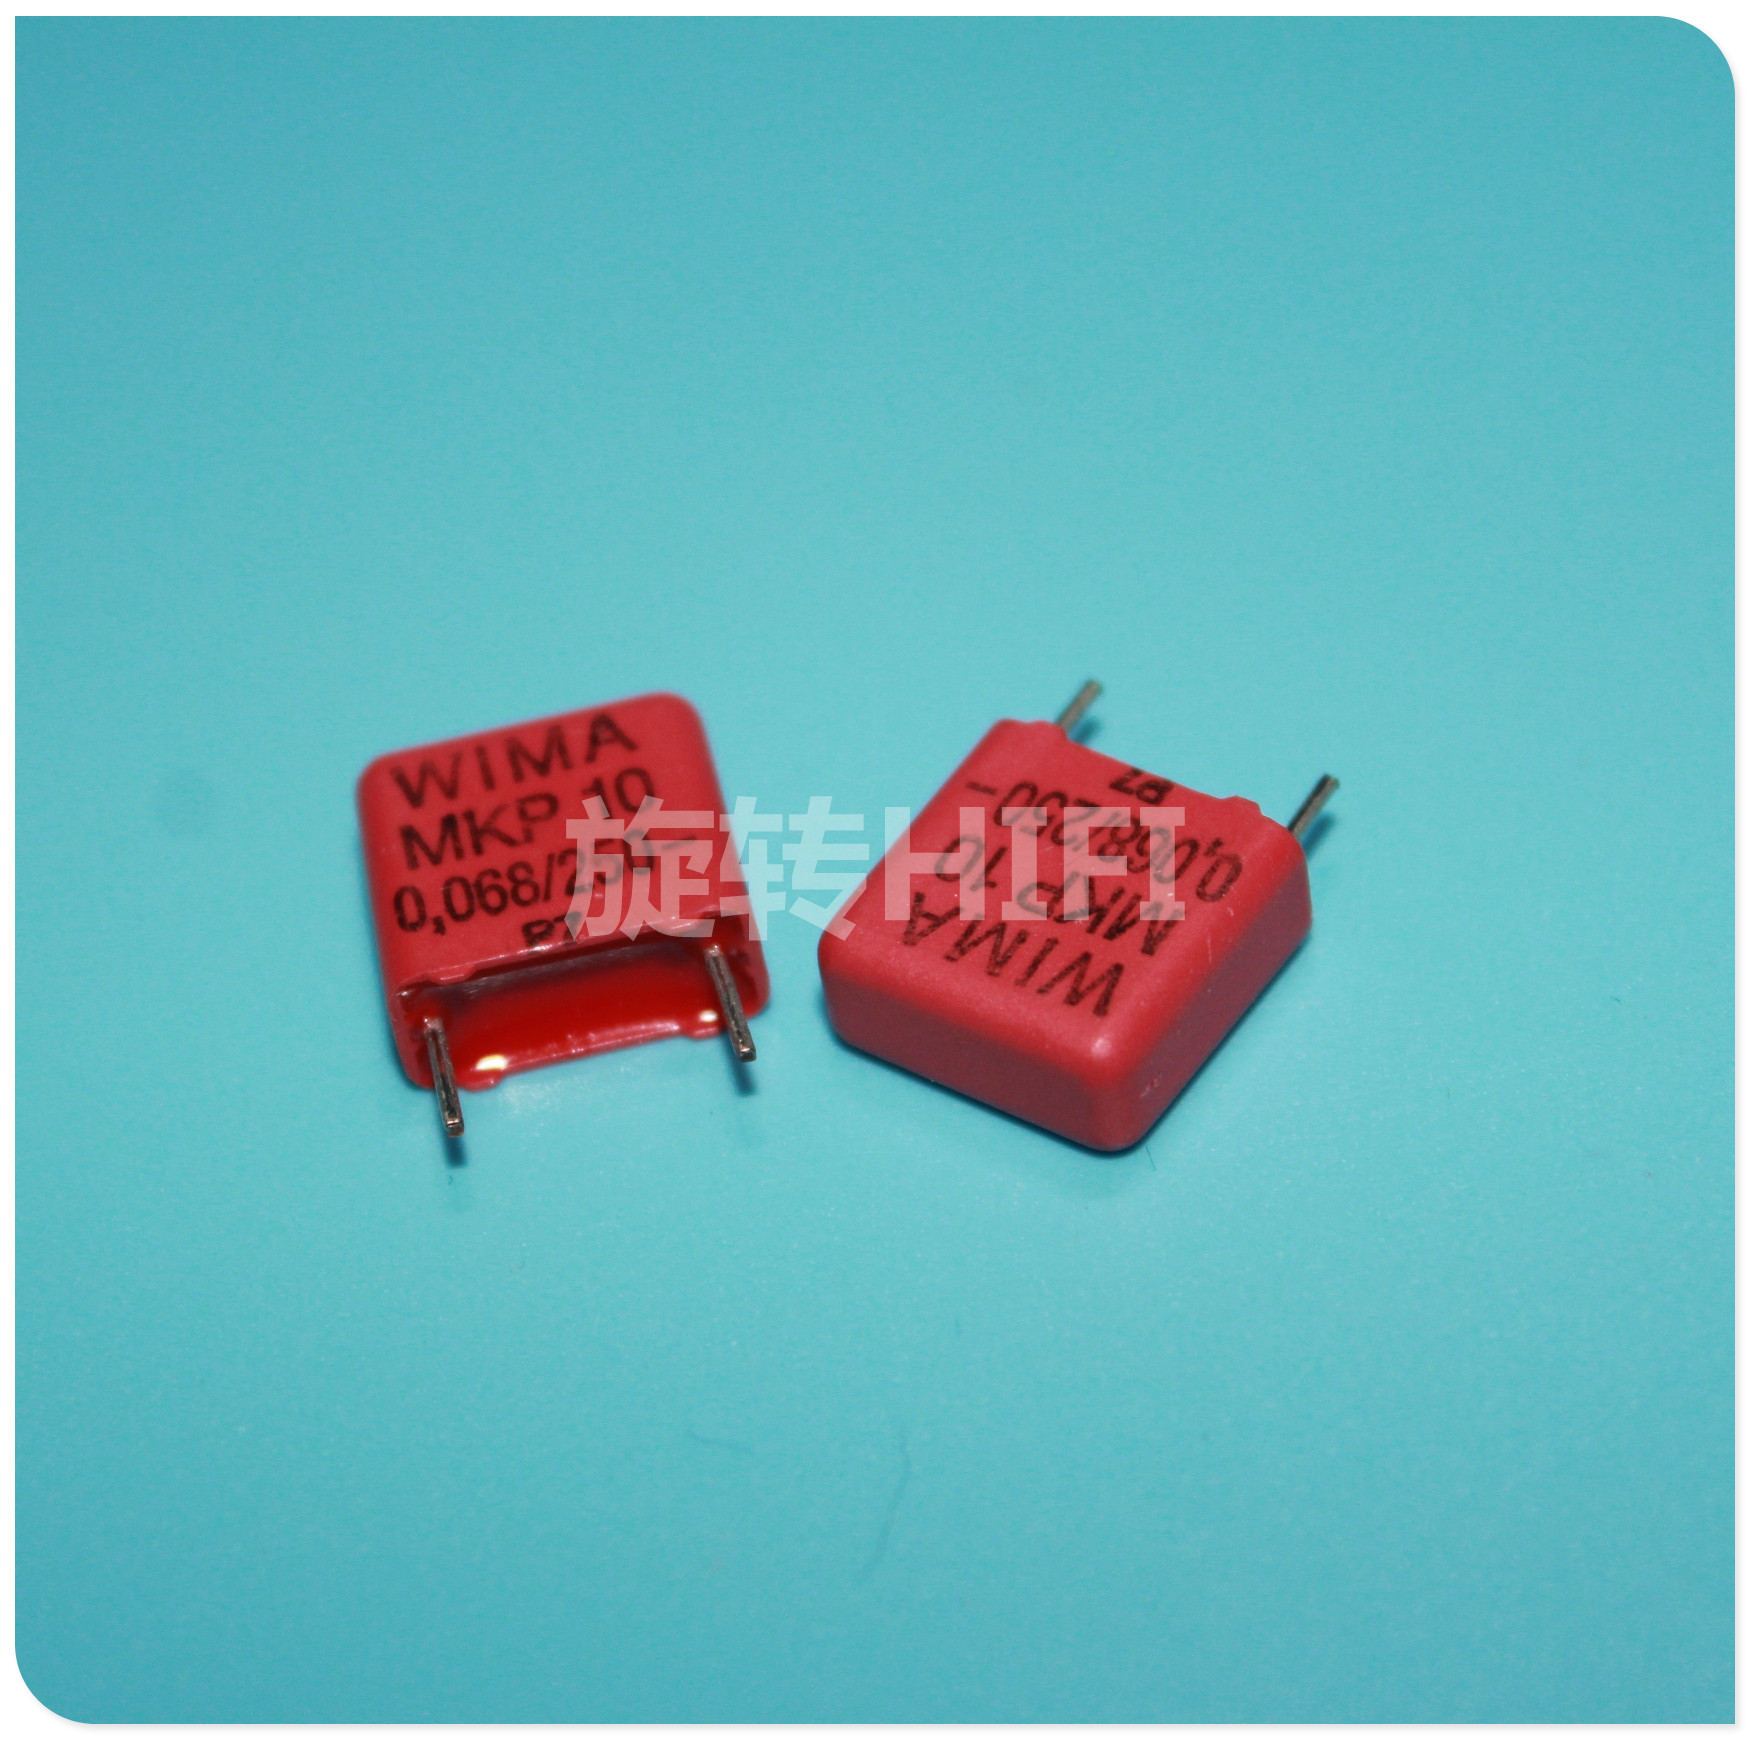 10PCS RED WIMA MKP10 0.068UF 250V P10mm Original New MKP-10 683/250V Audio 68nf Film 683 PCM10 Hot Sale 0.068uf/250v